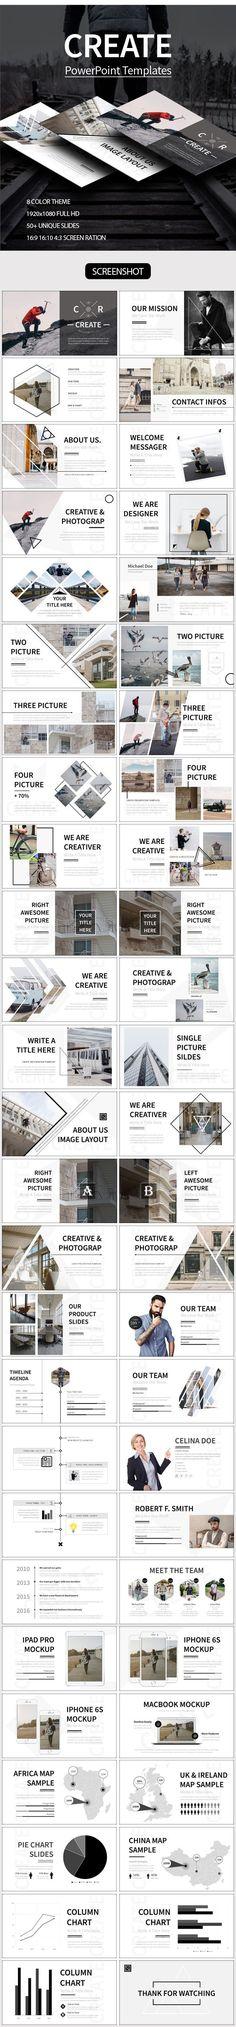 CREATE Powerpoint Template - Creative PowerPoint Templates #infografias #infographic